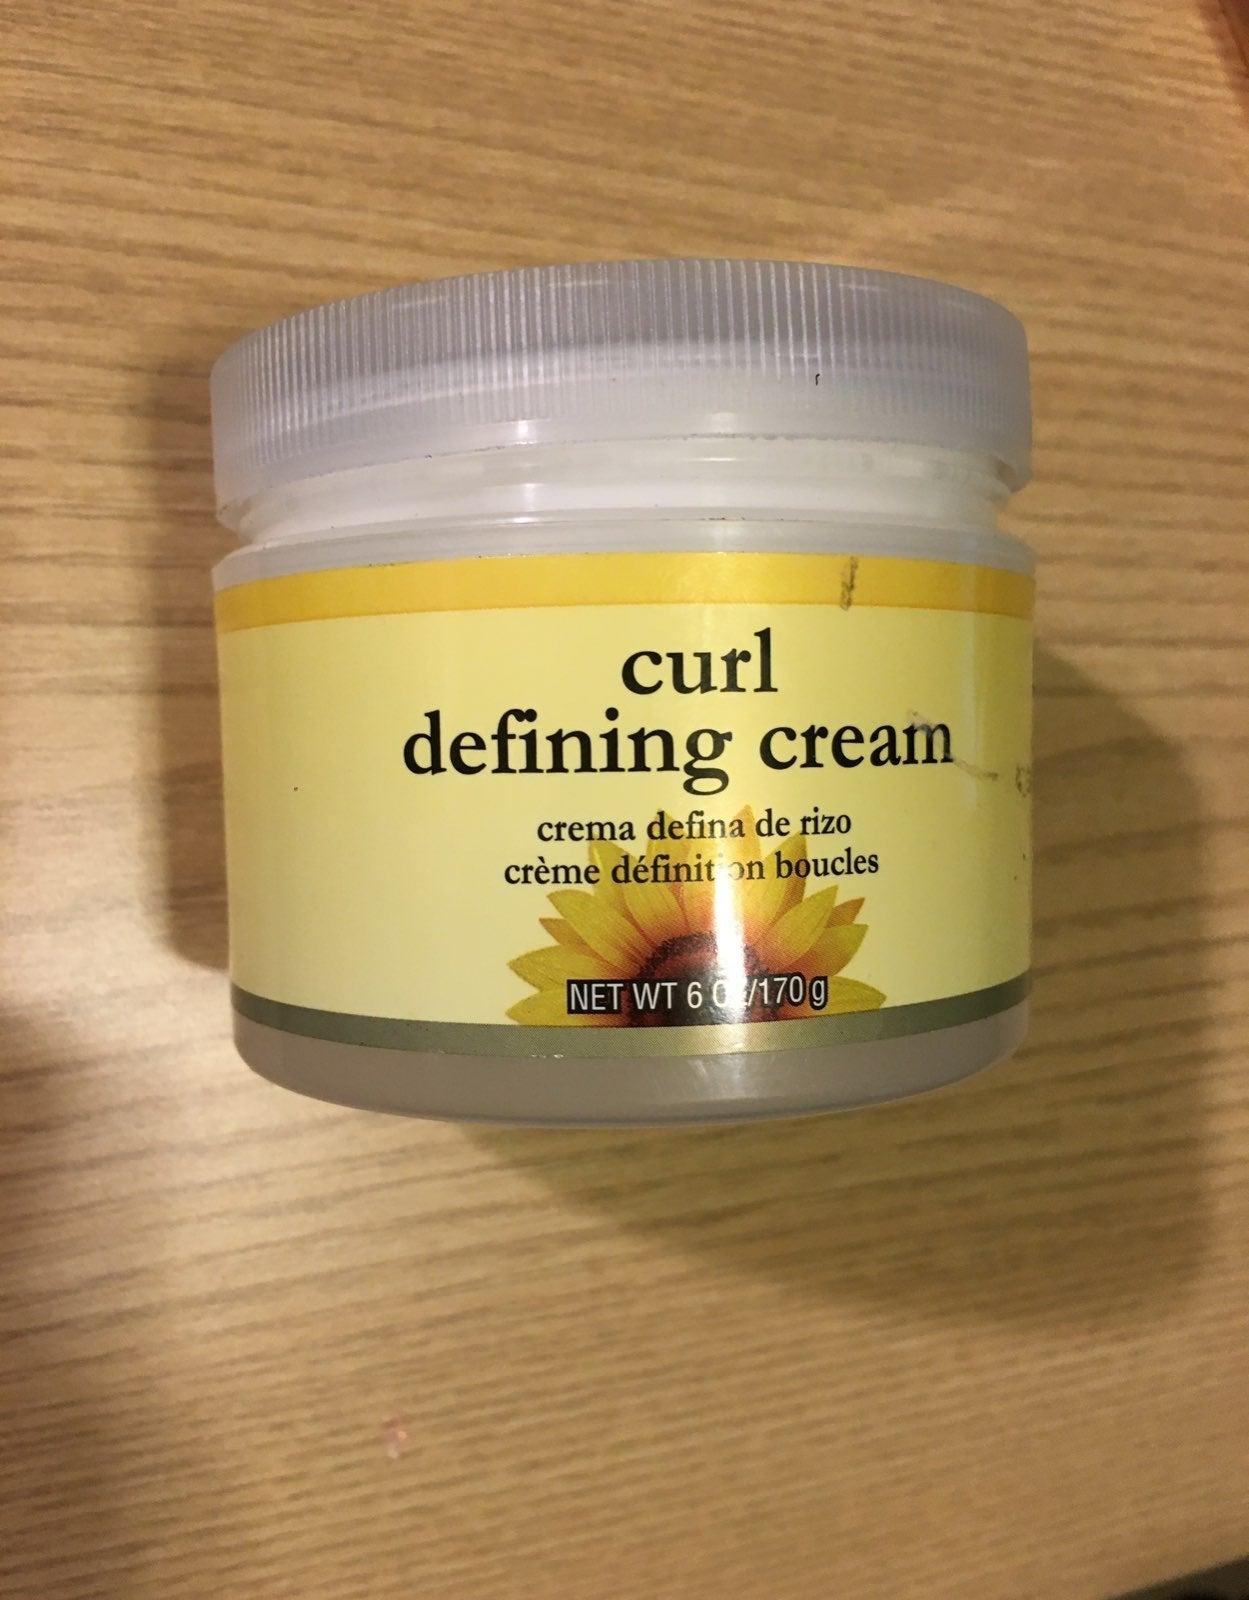 Jane carters curl defining cream